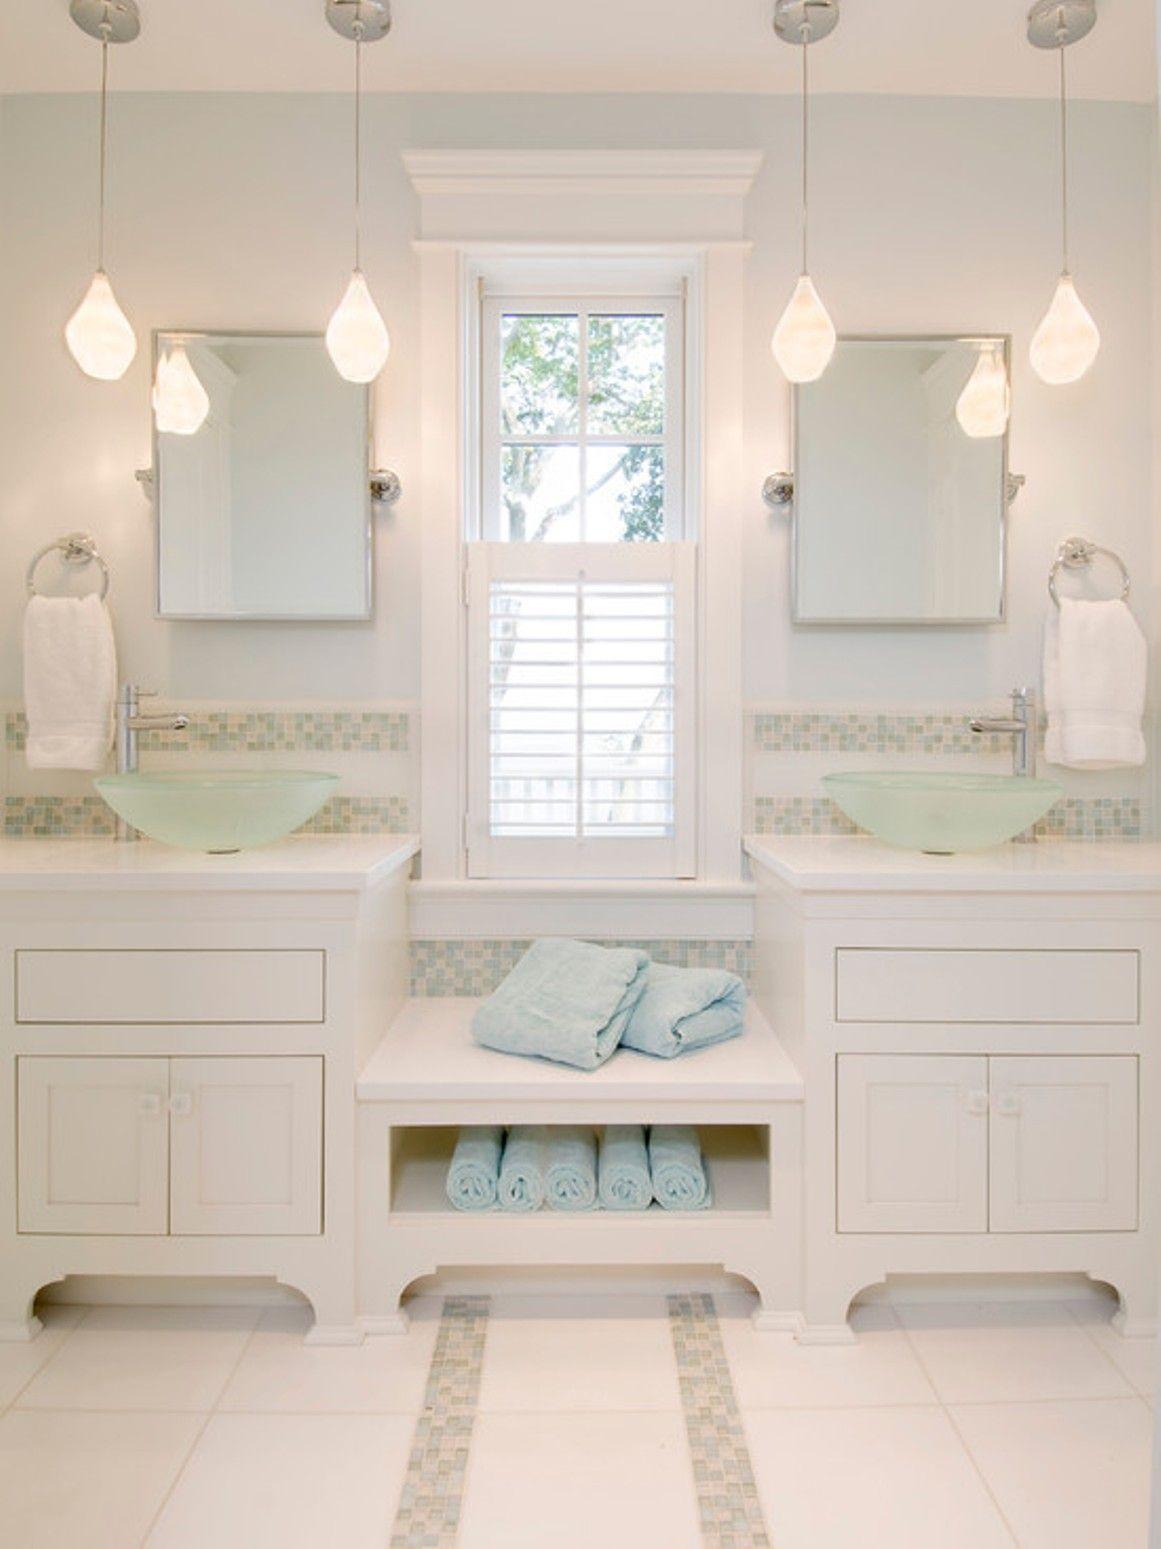 Best pendant lighting bathroom vanity for awesome nuance white bathroom with pendant lighting bathroom vanity